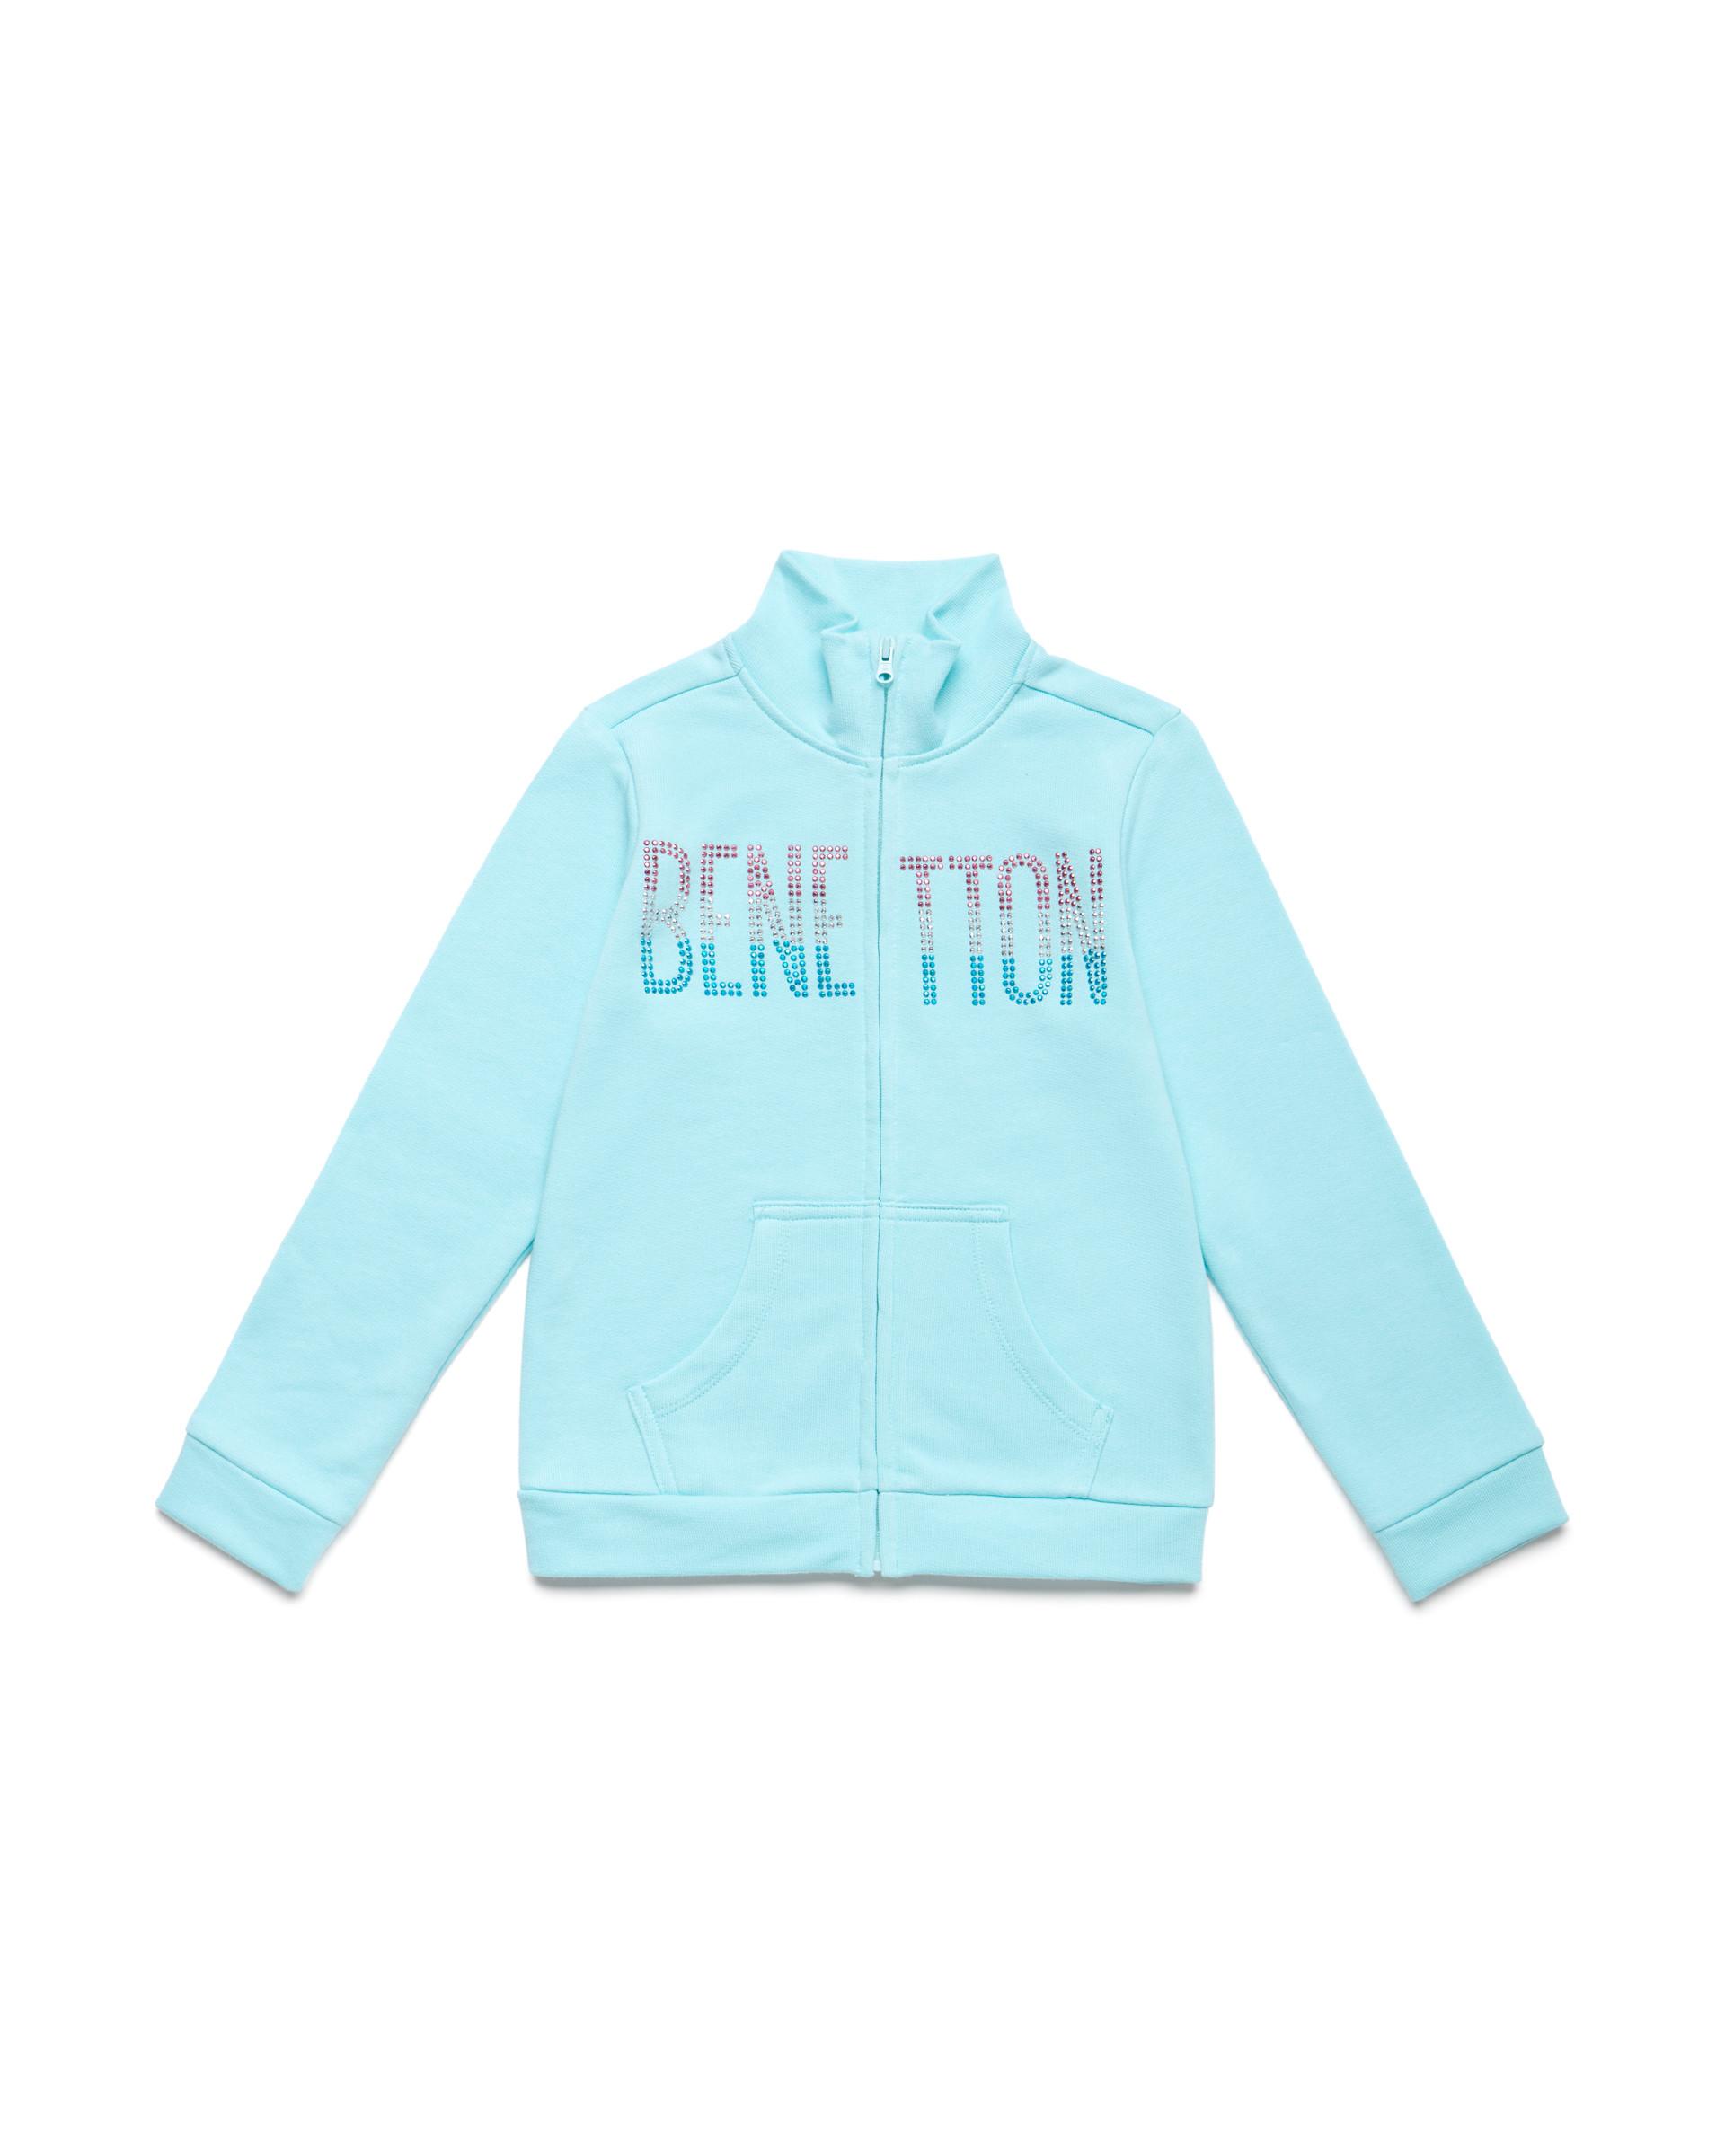 Купить 20P_3J68C5793_0Z8, Толстовка для девочек Benetton 3J68C5793_0Z8 р-р 110, United Colors of Benetton, Толстовки для девочек